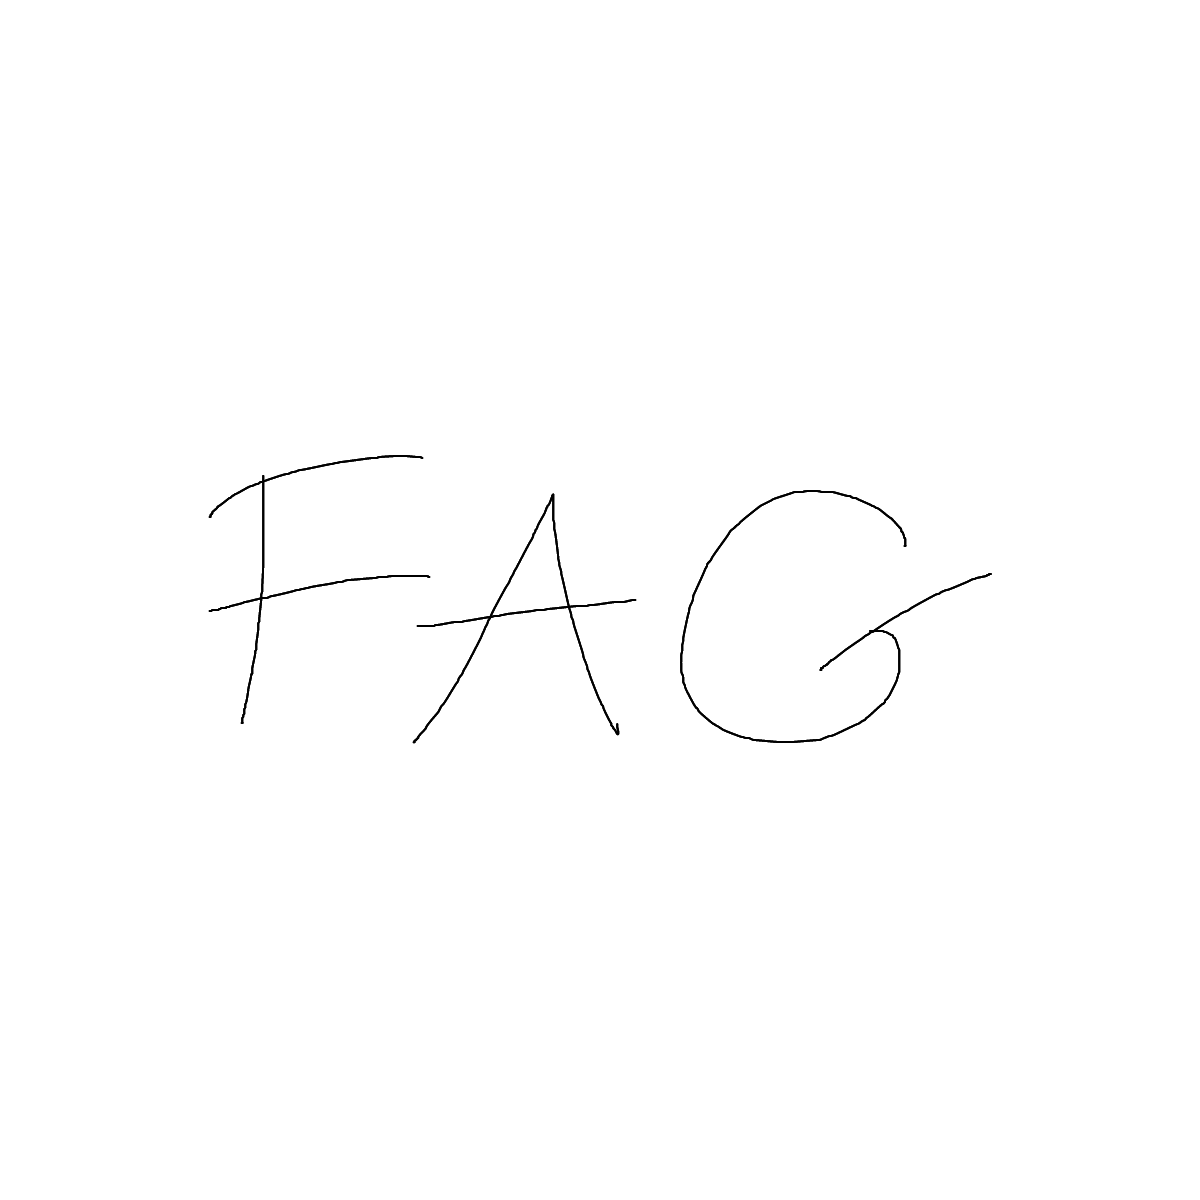 BAAAM drawing#14855 lat:31.8836288452148440lng: 34.8153343200683600